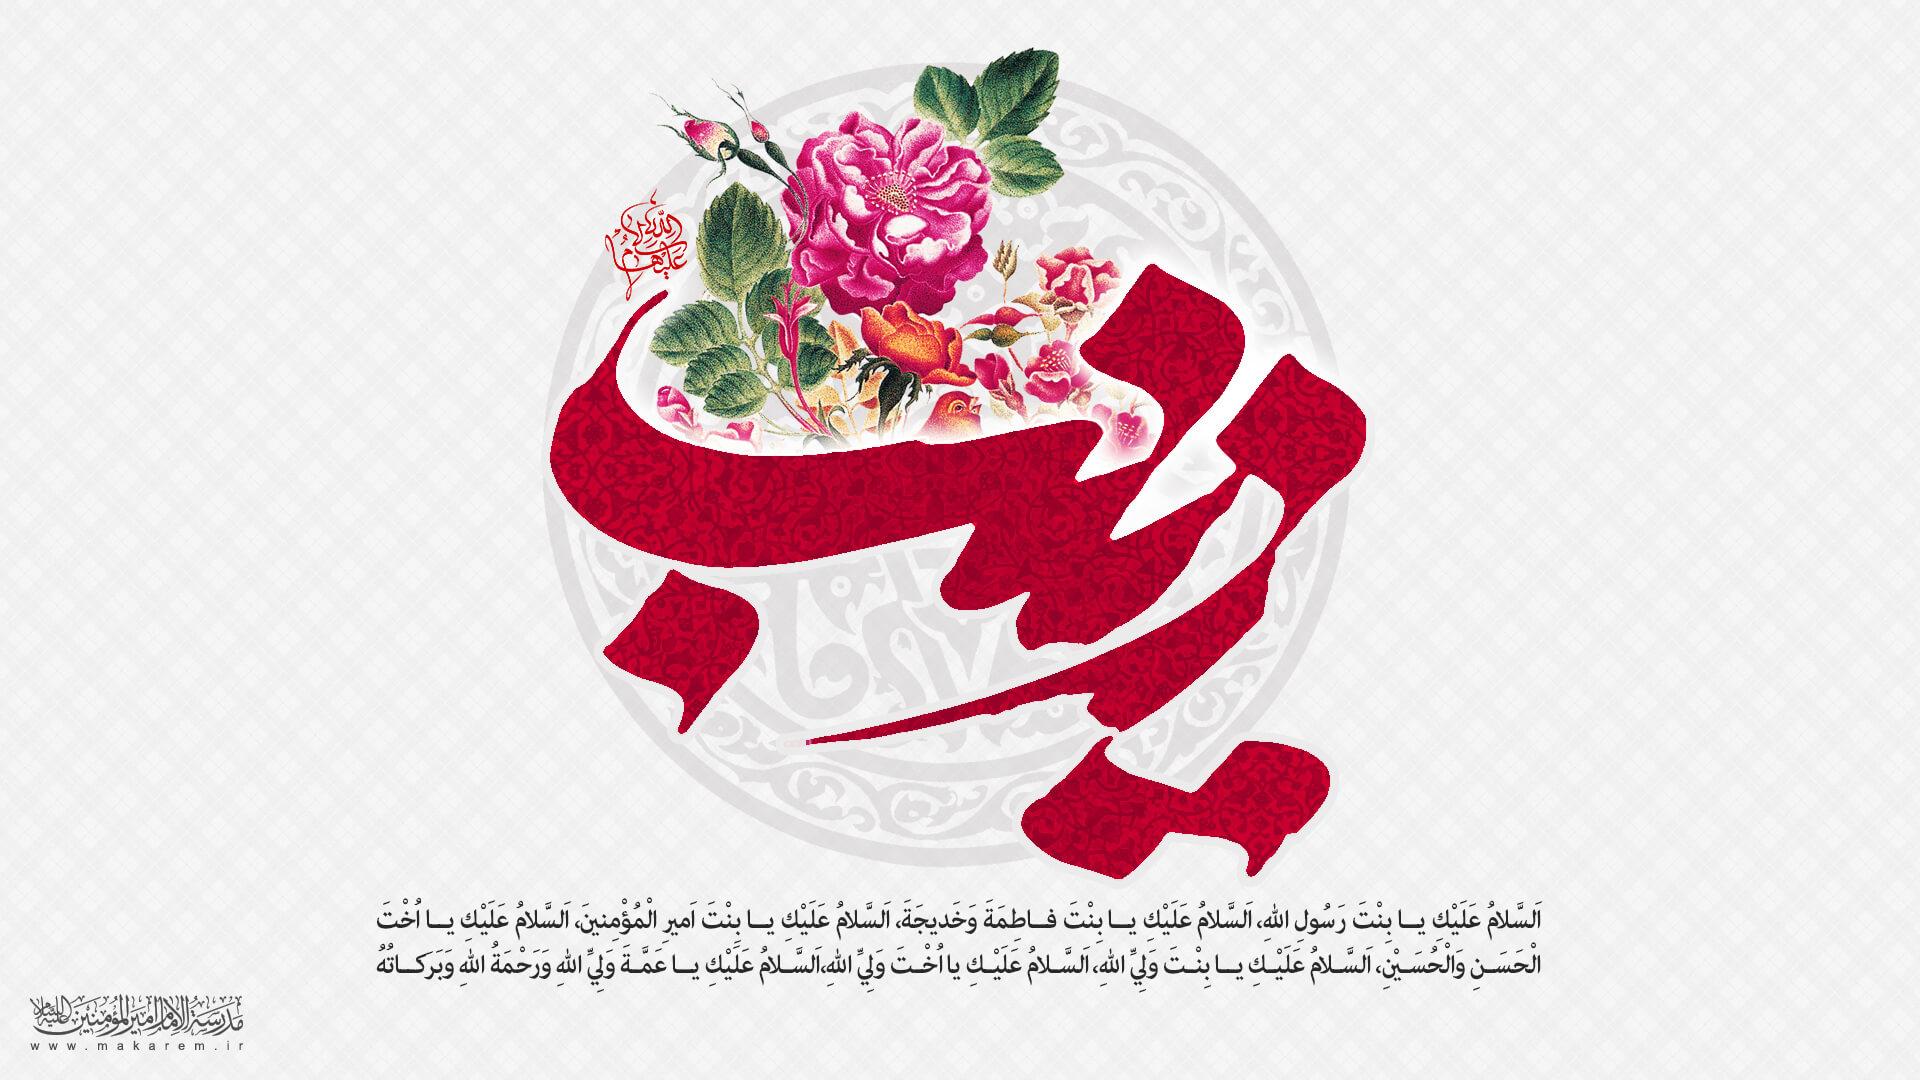 حضرت زینب 04-مدرسه الامام امیر المومنین (ع)